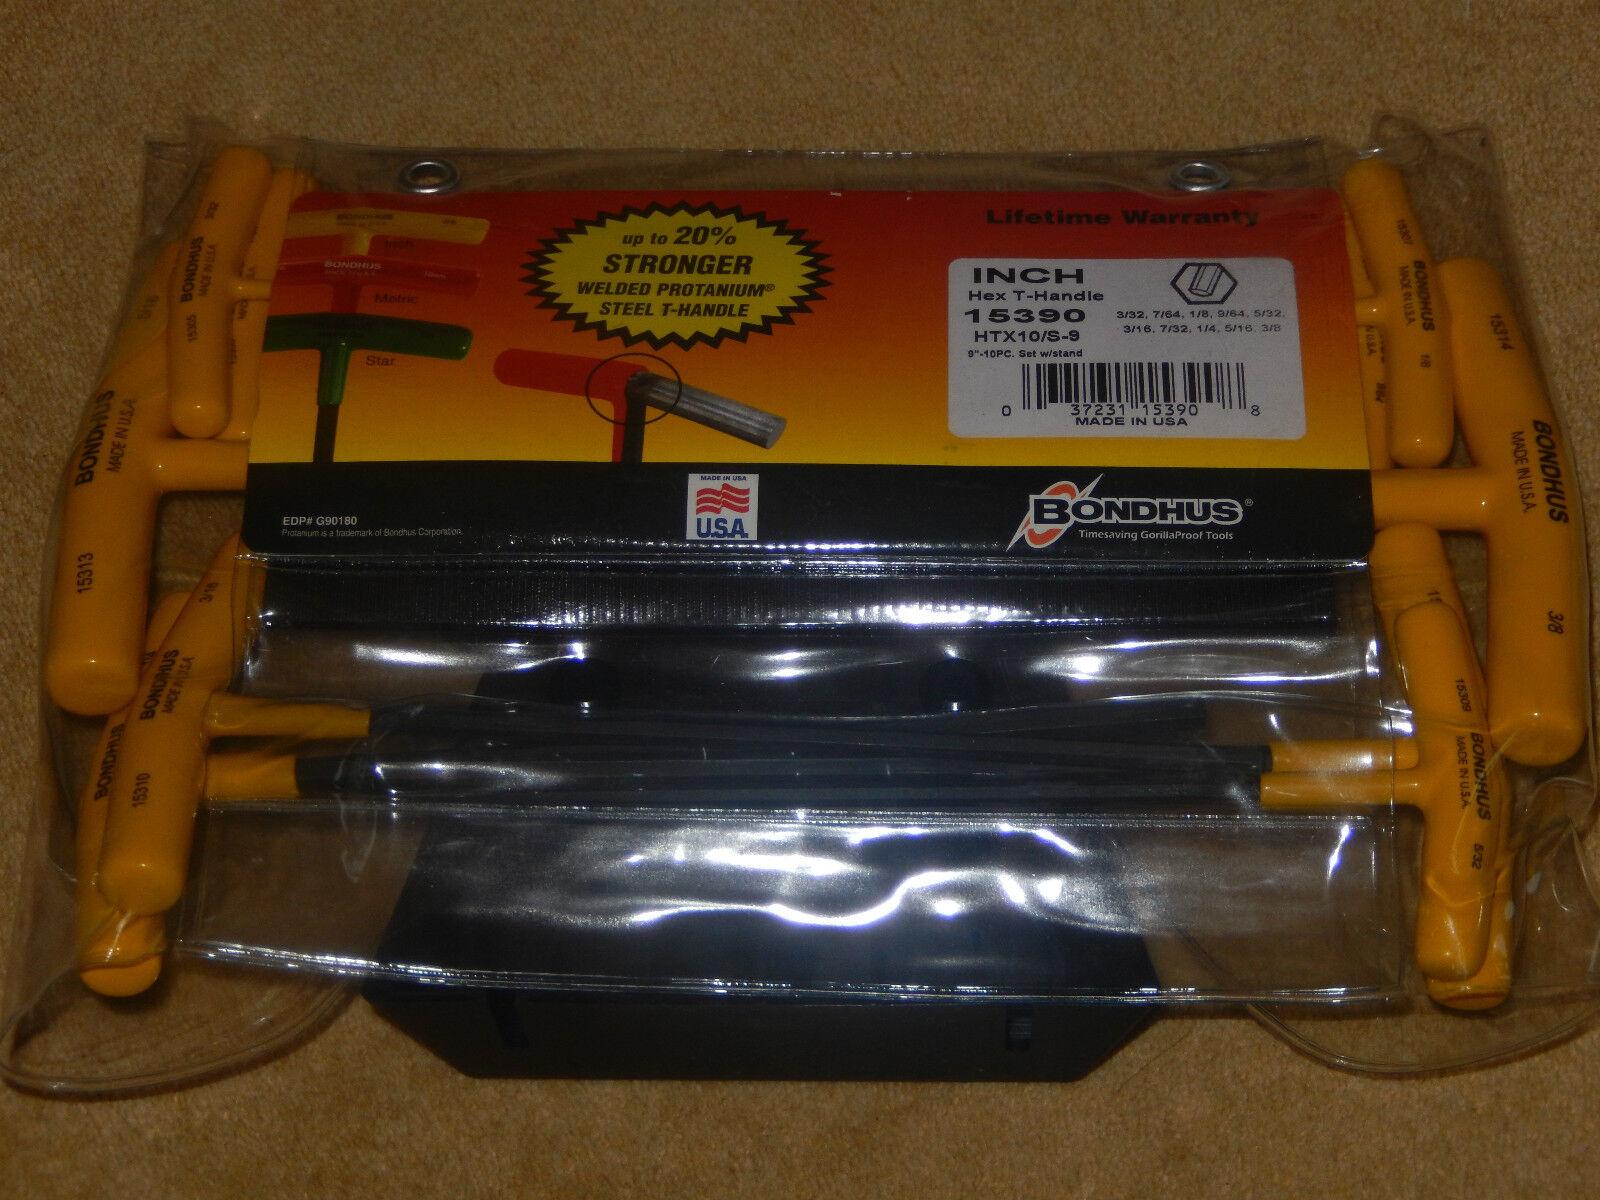 HTX10S9 Bondhus 9  T Handle 10 Piece Hex Key Allen Set With Stand